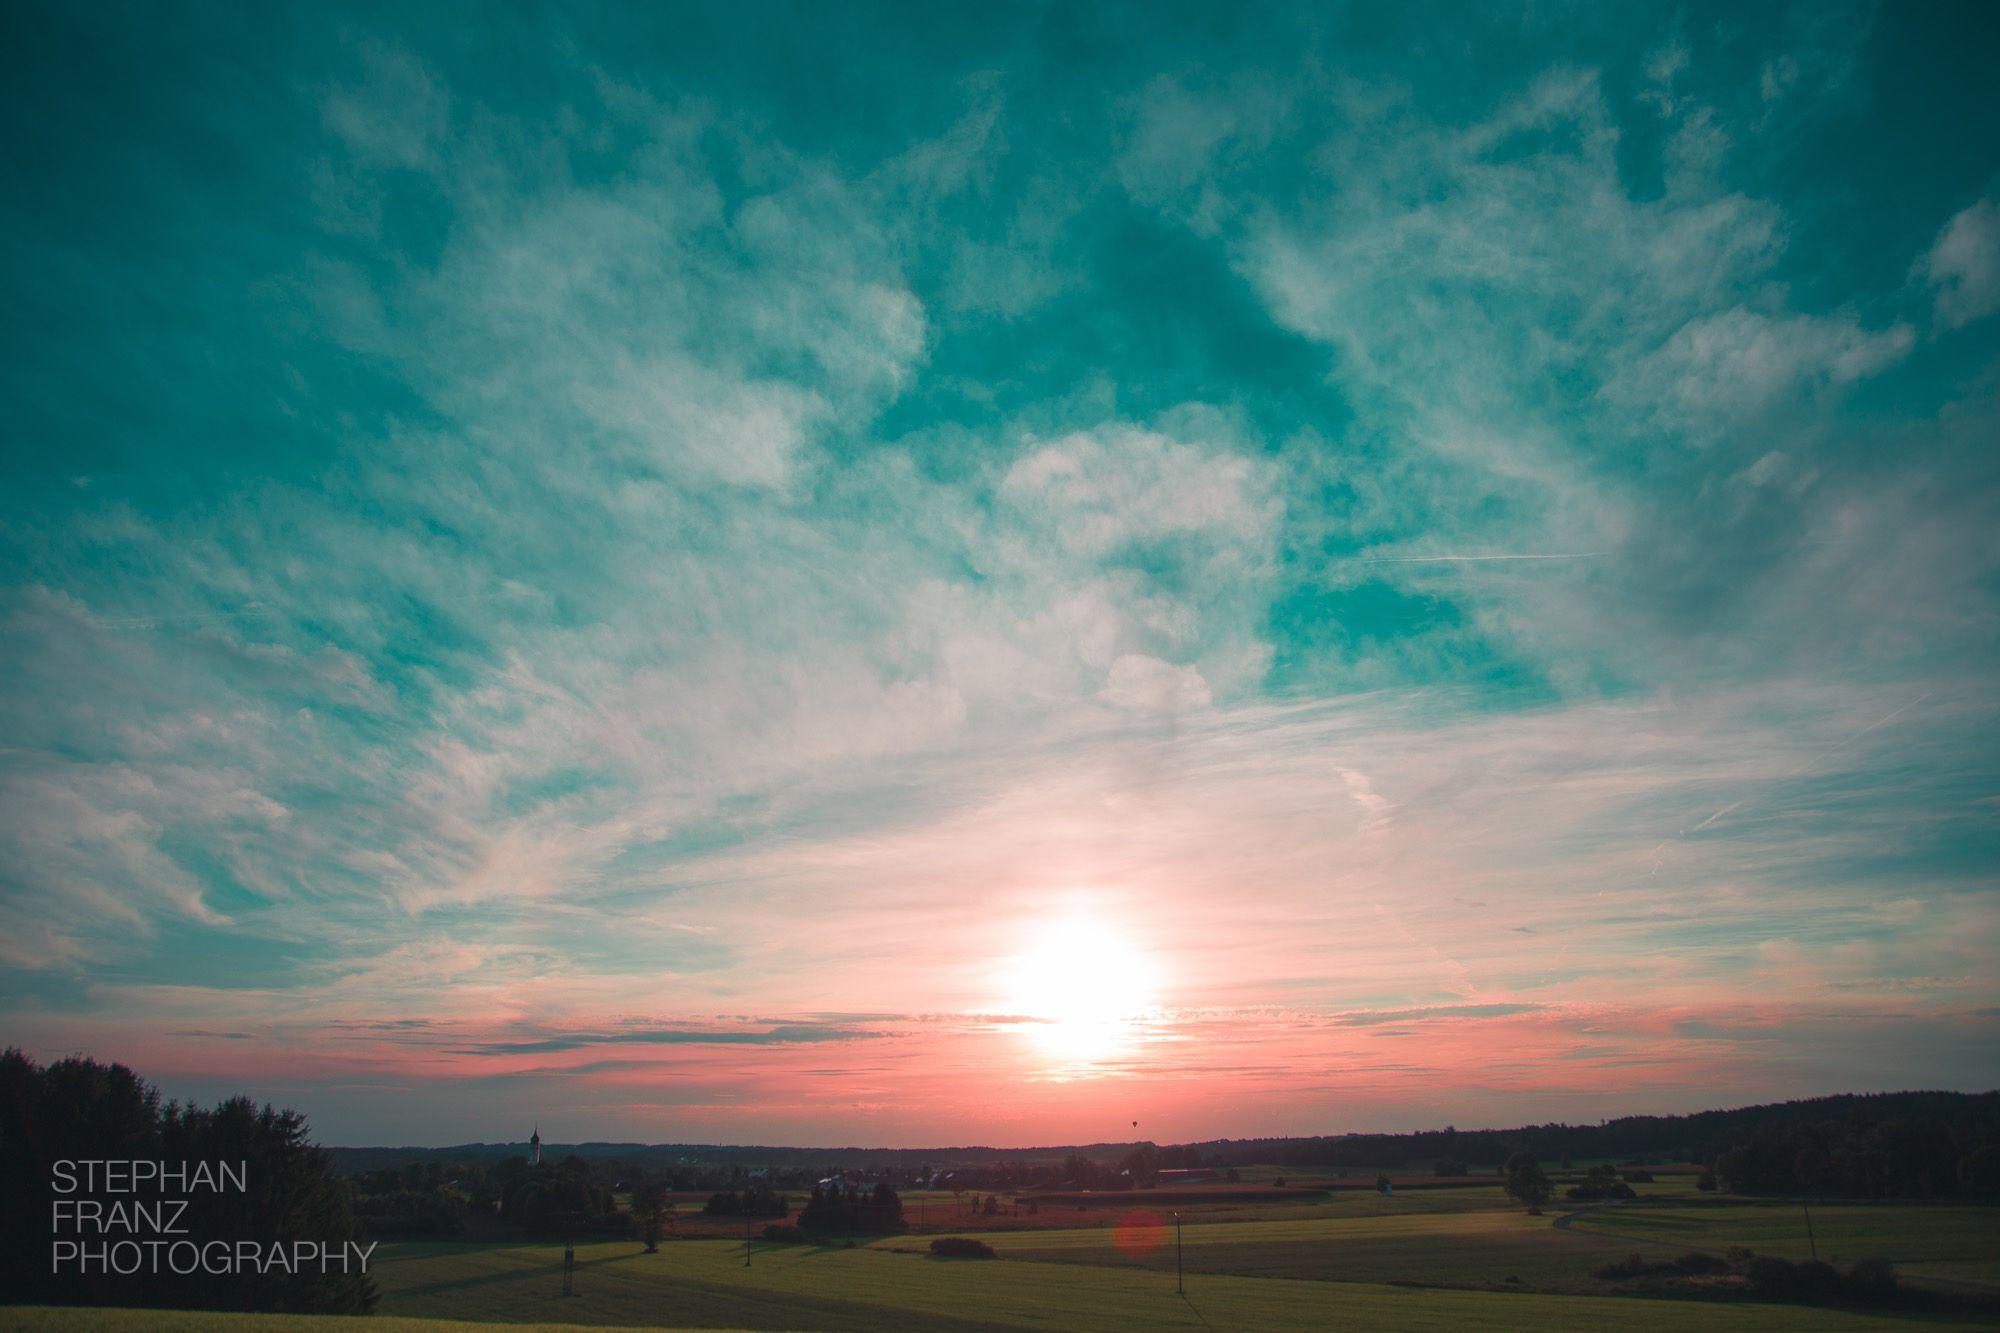 Sonnenuntergang-Ballon-Bayern-Stephan-Franz-Fotograf-Photography-3